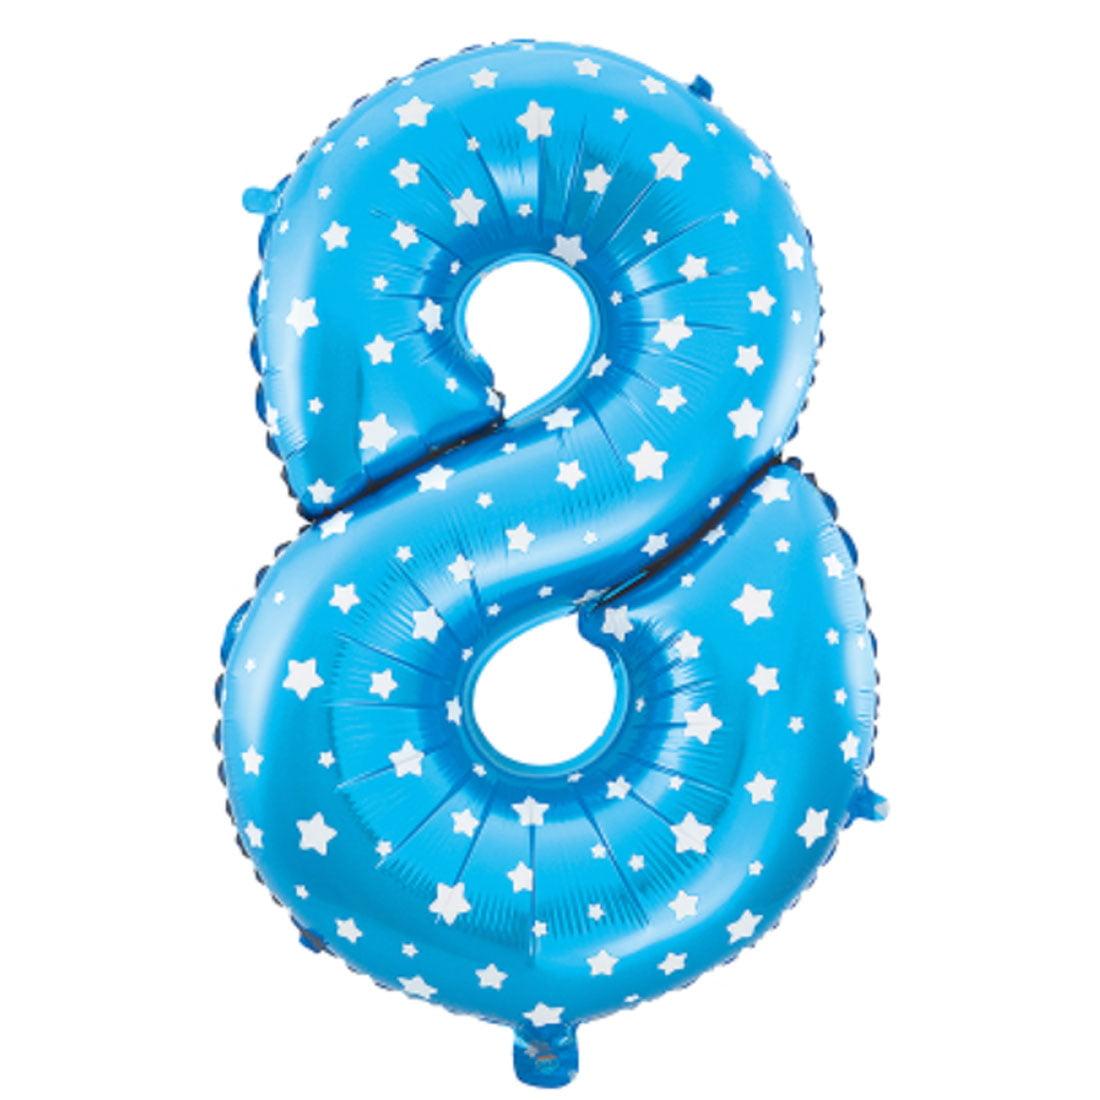 "Unique Bargains 16"" Blue Foil Number 8 Shape Balloon Helium Birthday Wedding Decor"